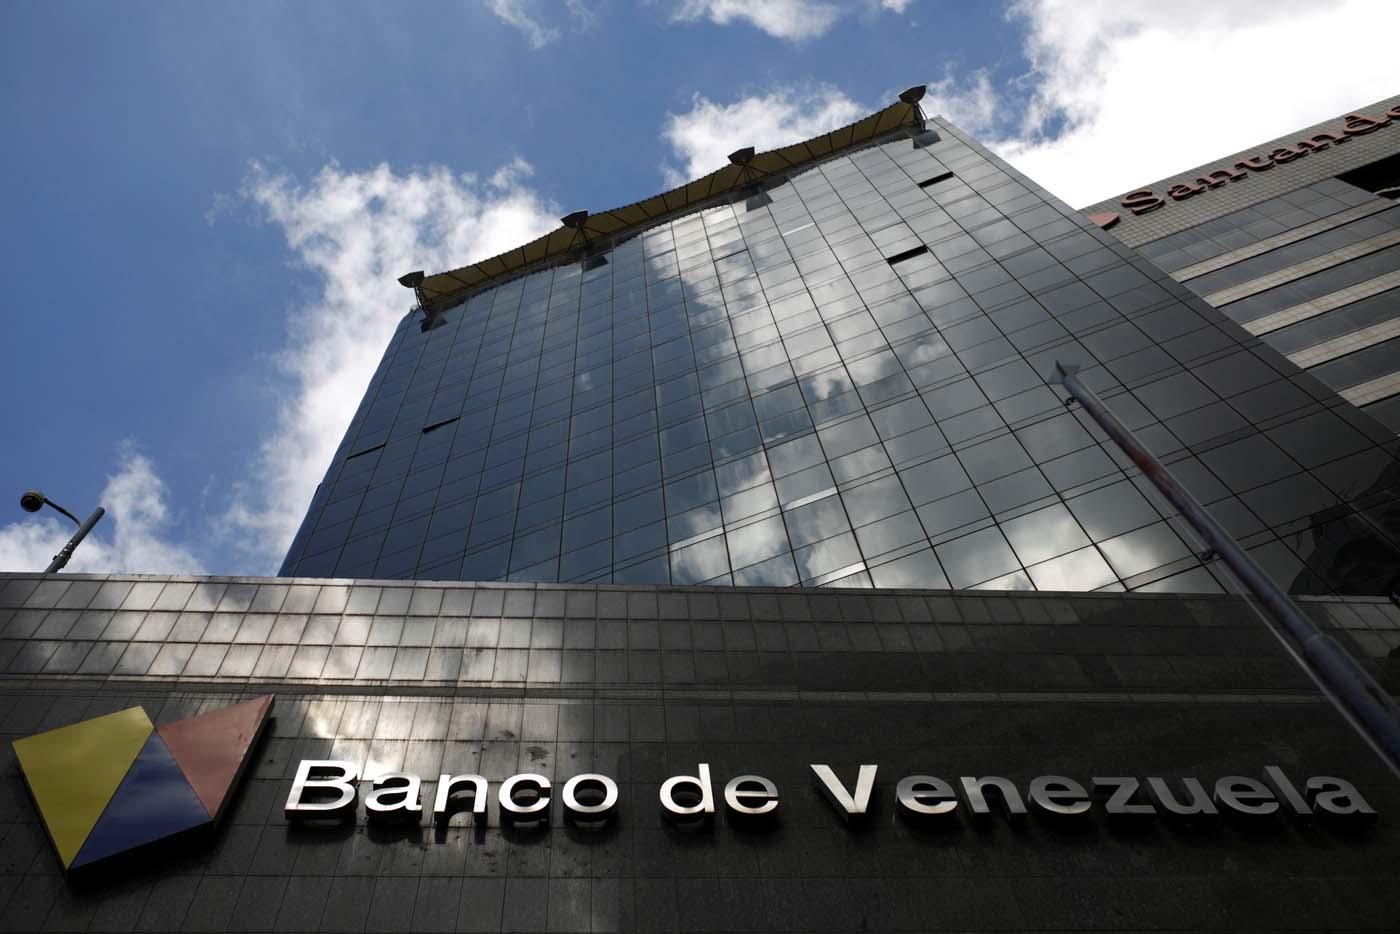 The logo of Banco de Venezuela is seen in a building in Caracas, Venezuela March 14, 2017. Picture taken March 14, 2017. REUTERS/Marco Bello To match Exclusive VENEZUELA-BANKS/